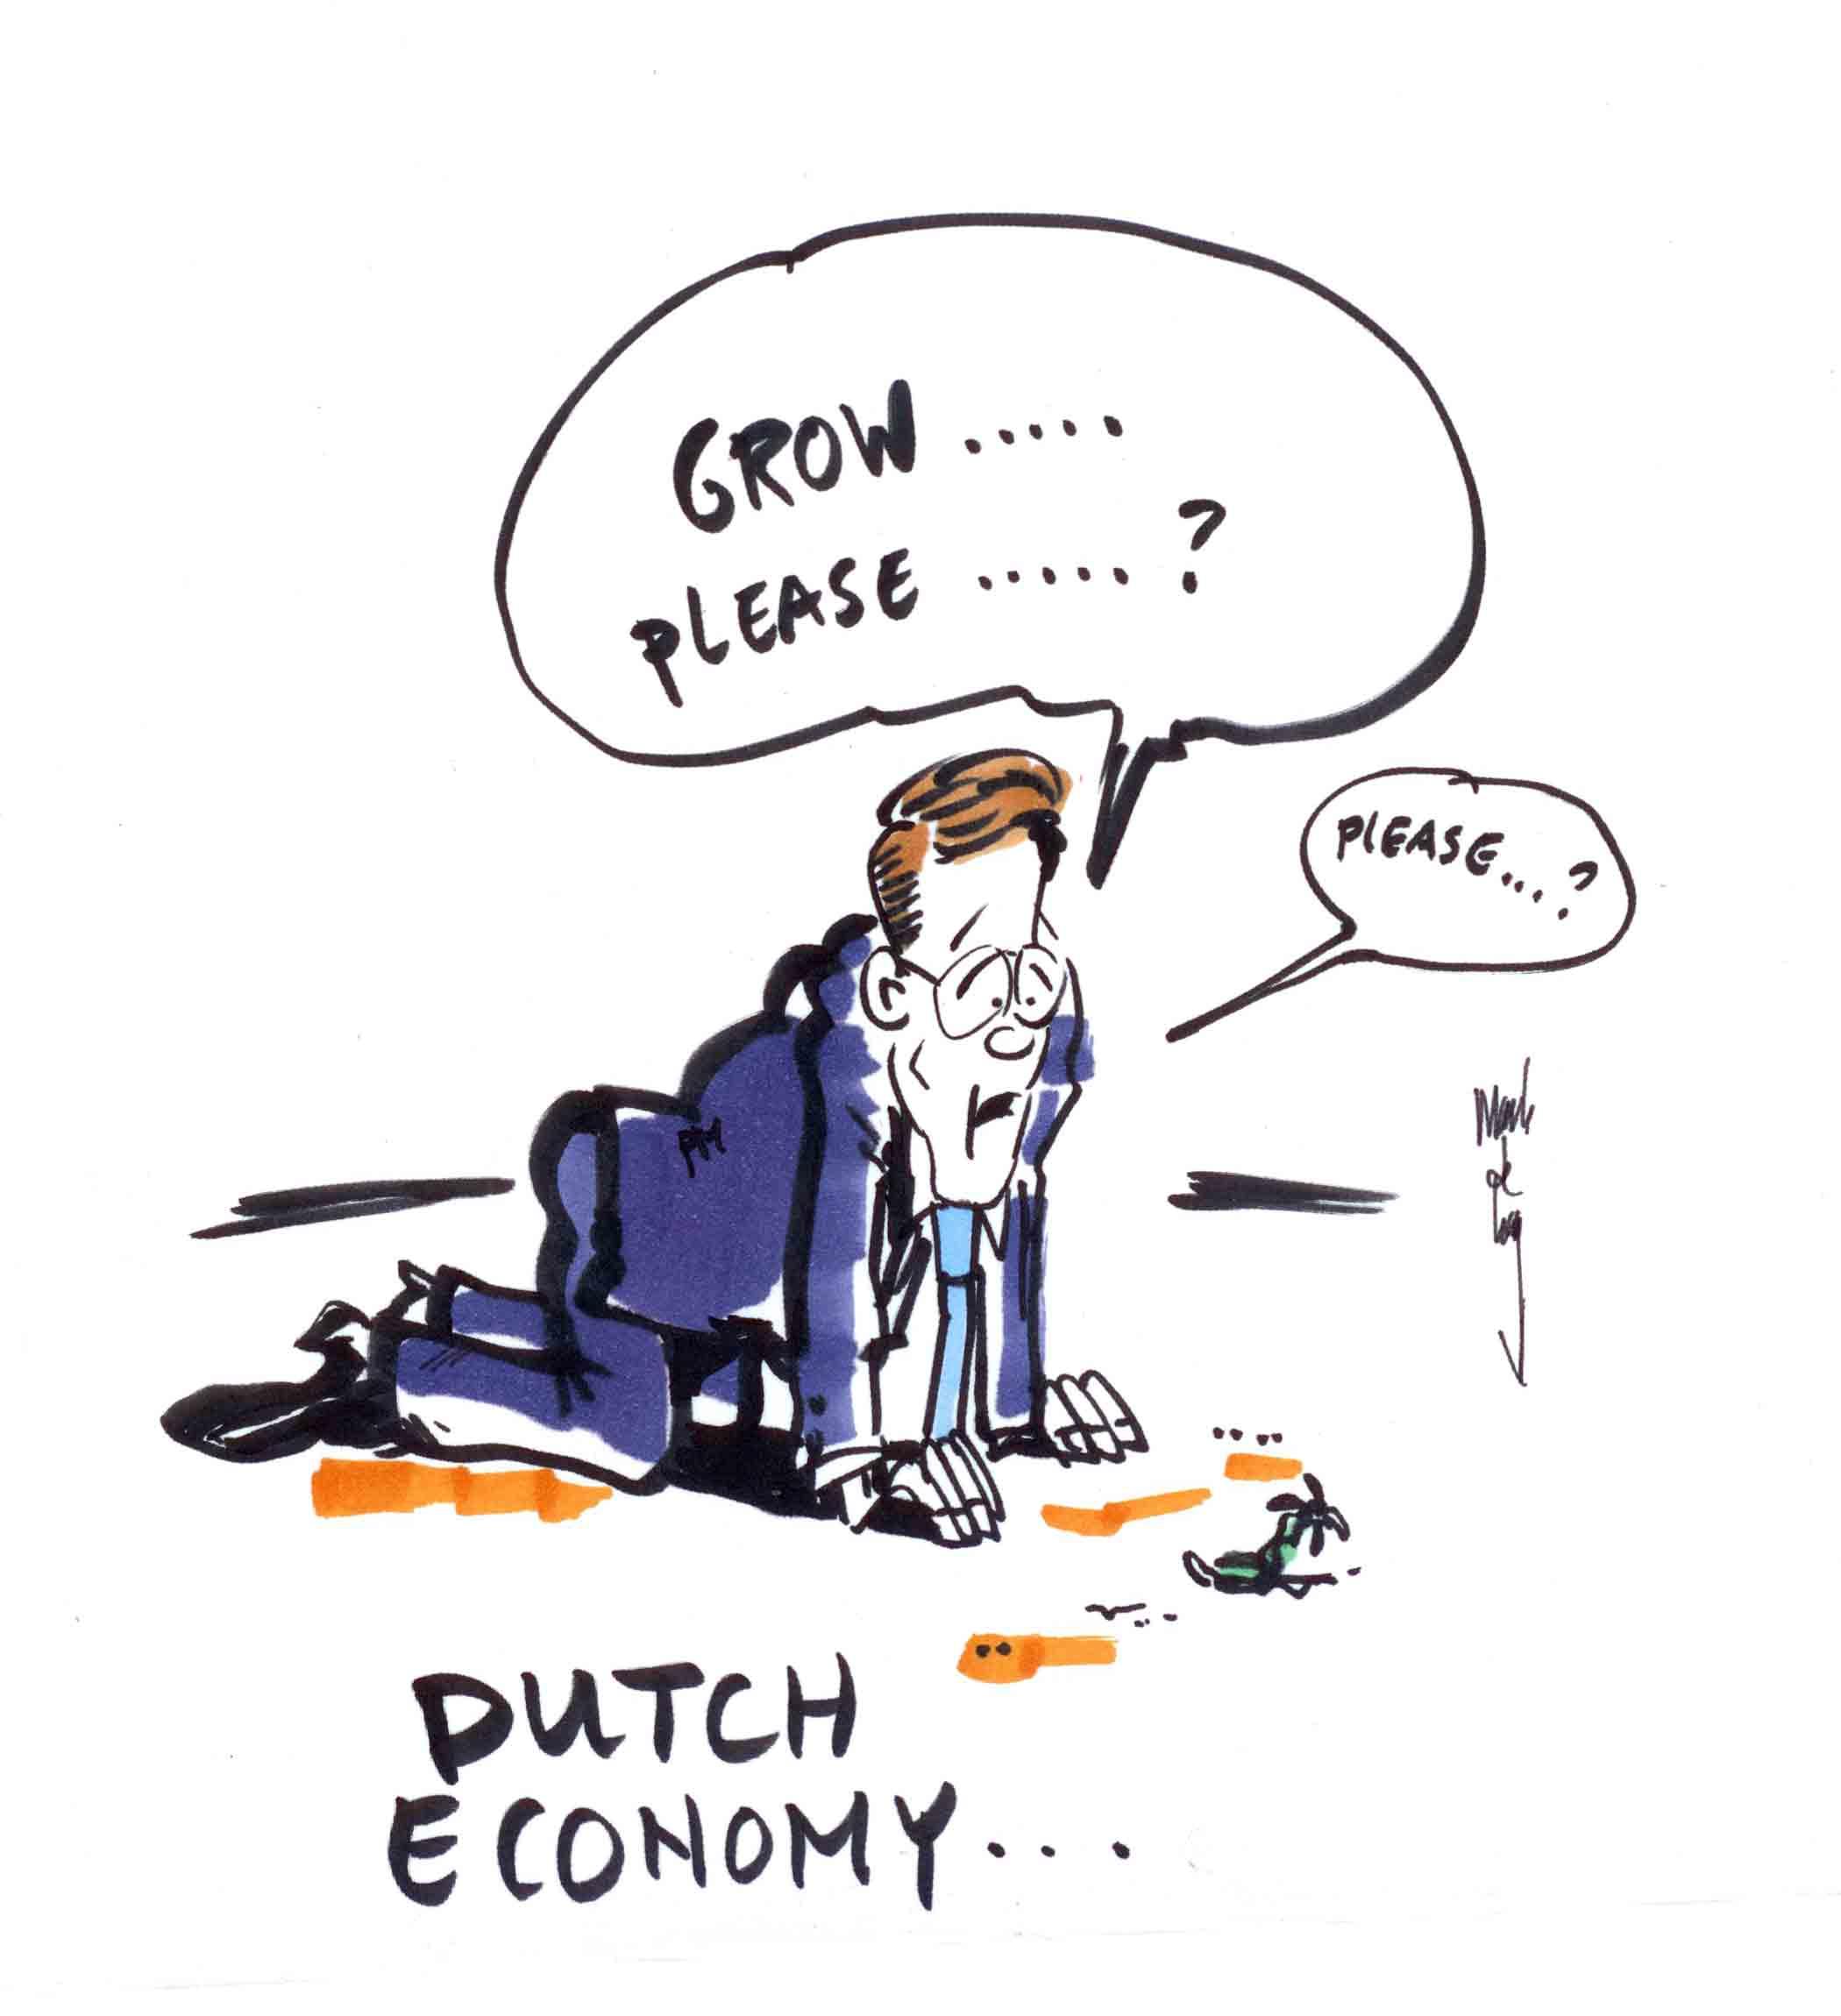 DutchEconomy.jpeg